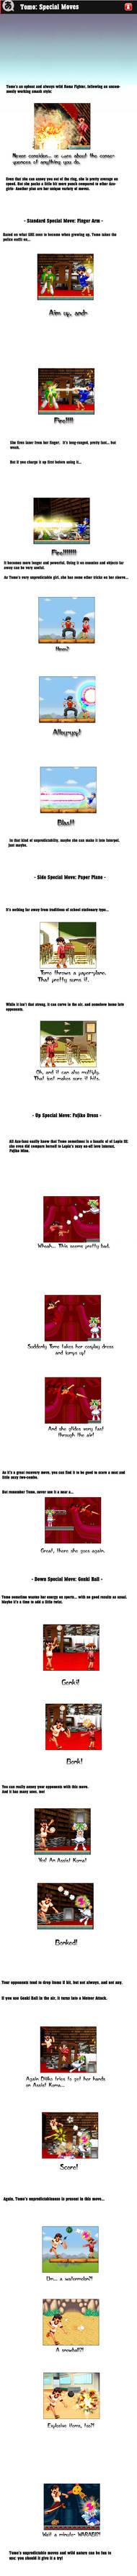 Tomo's Special Moves